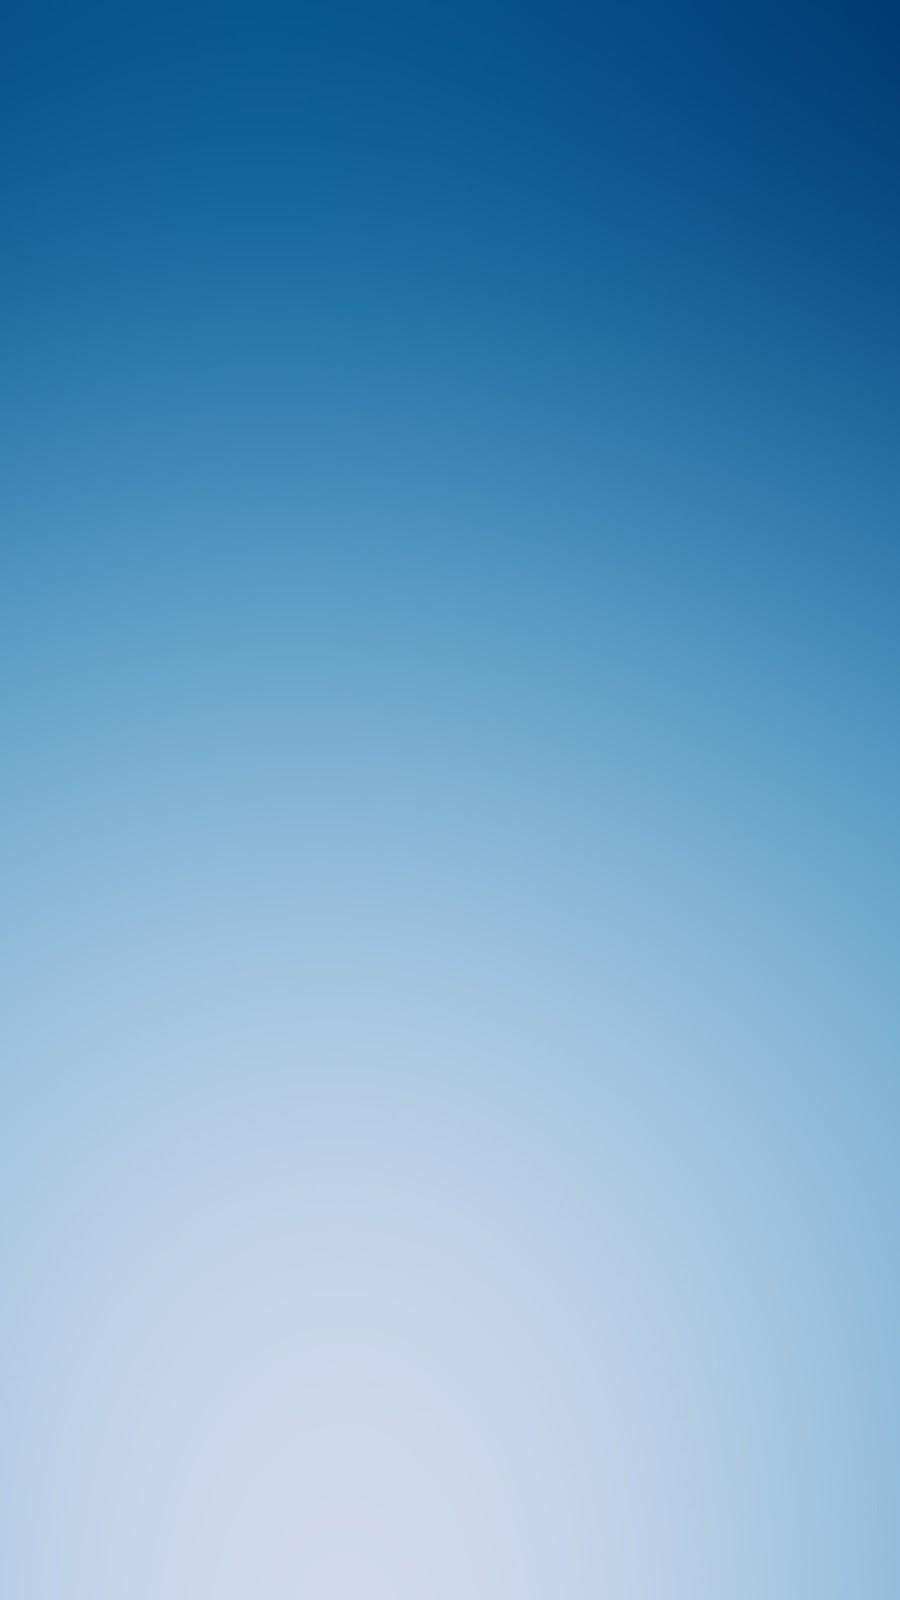 blue grey wallpaper iphone 7 blackberry themes